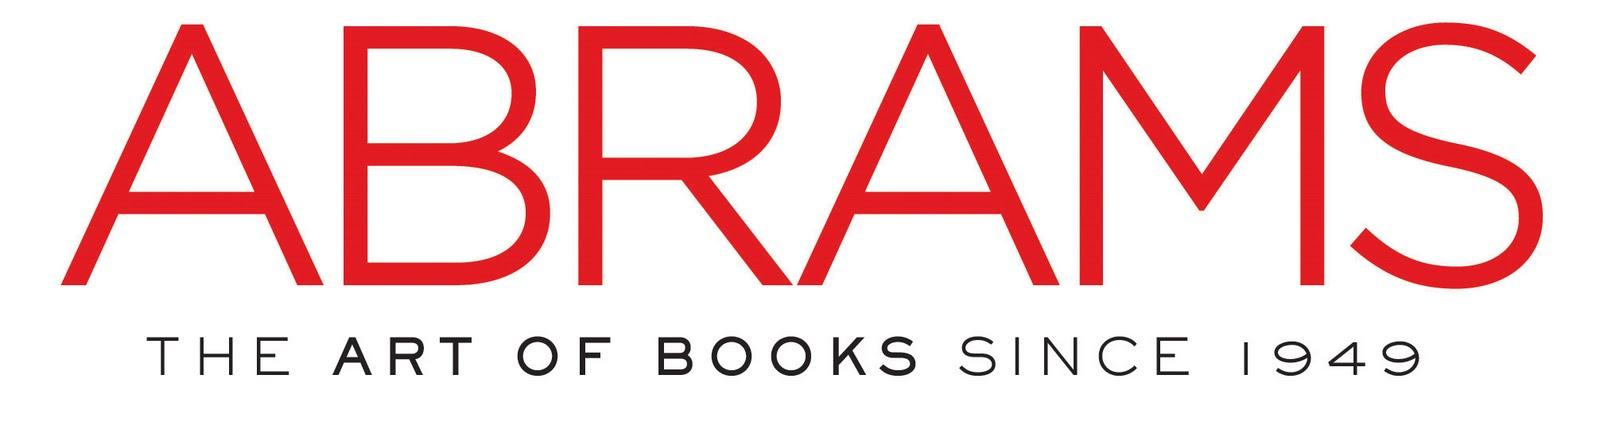 Abrams Books